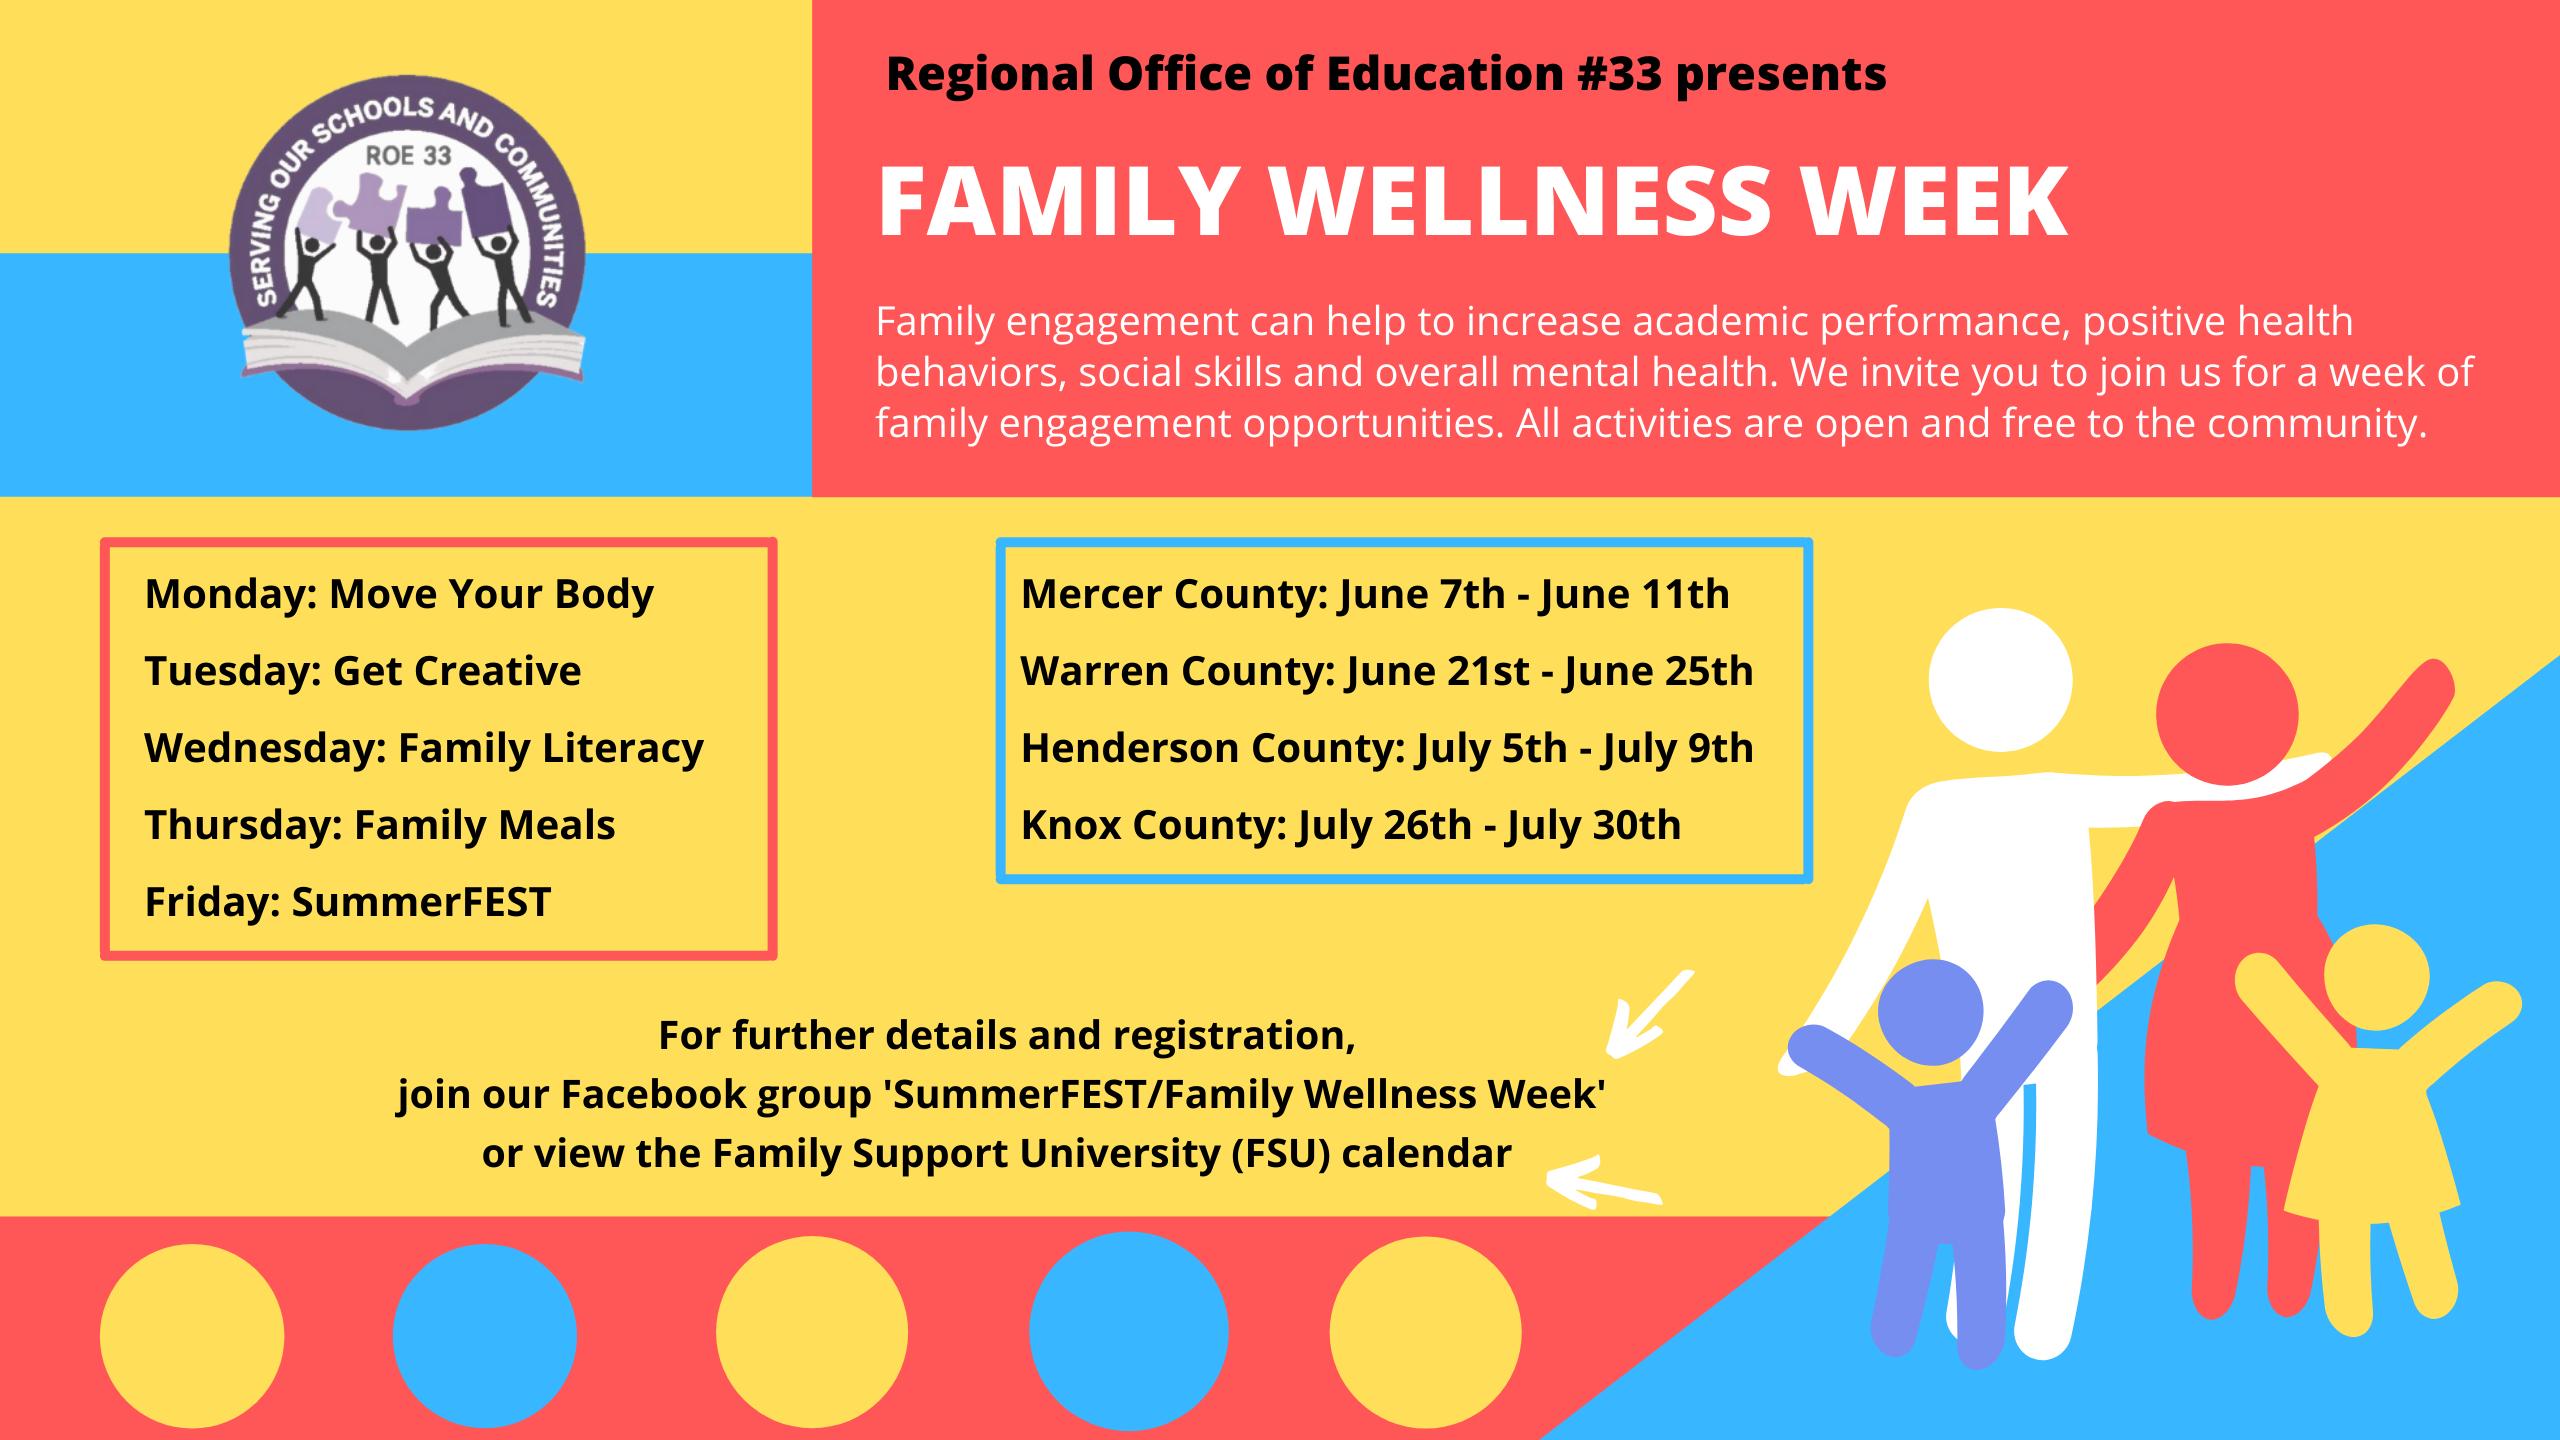 Family Wellness Week